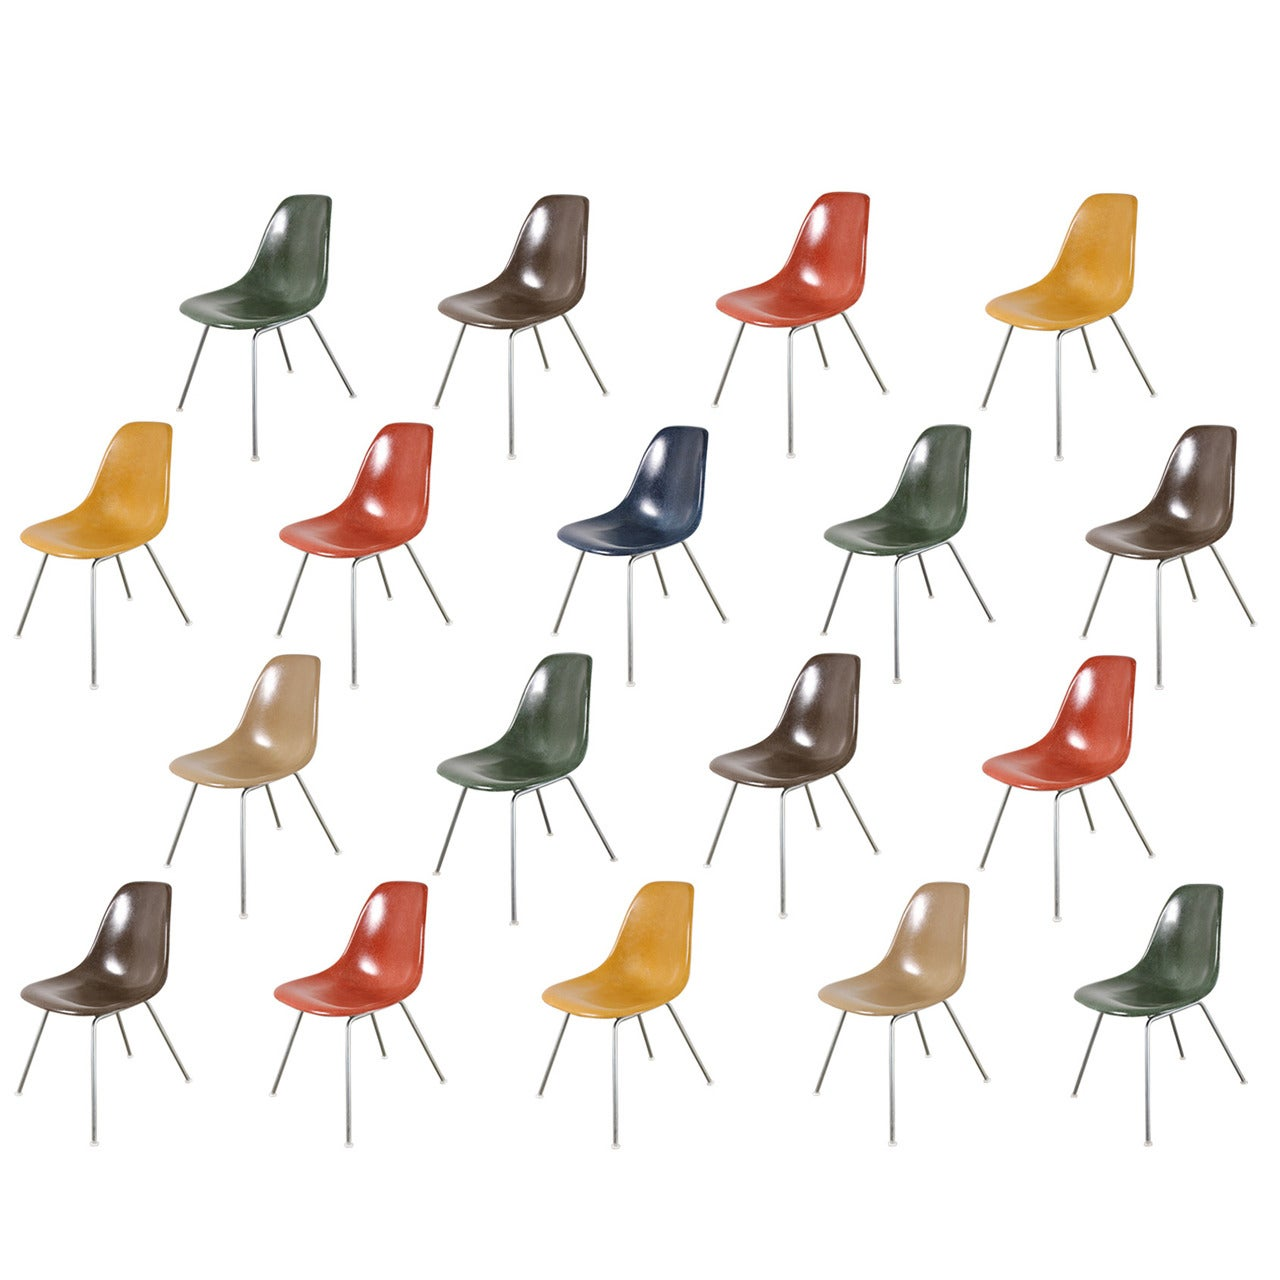 Original Eames Fiberglass Shell Chairs by Herman Miller